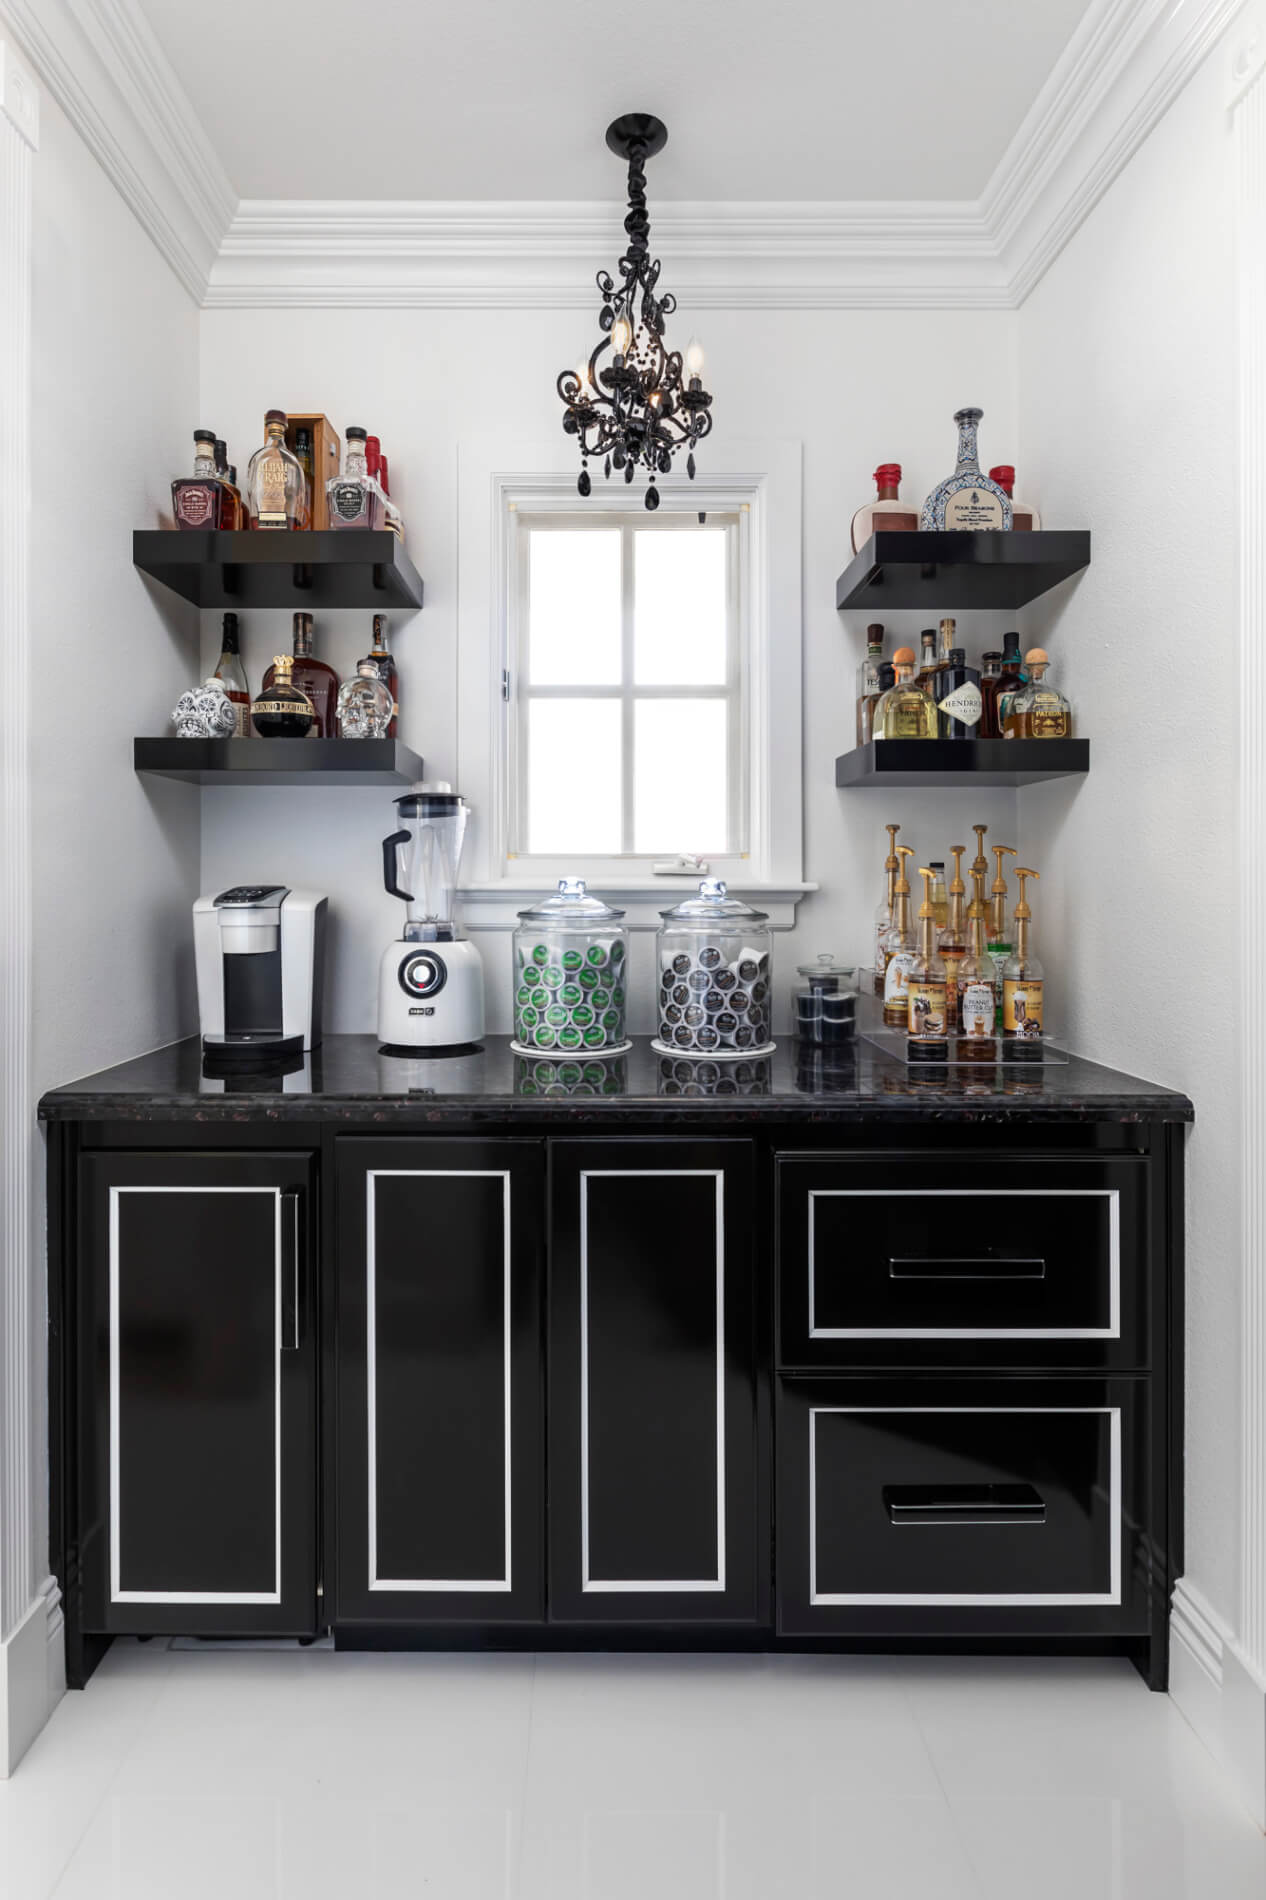 Butlers pantry remodel